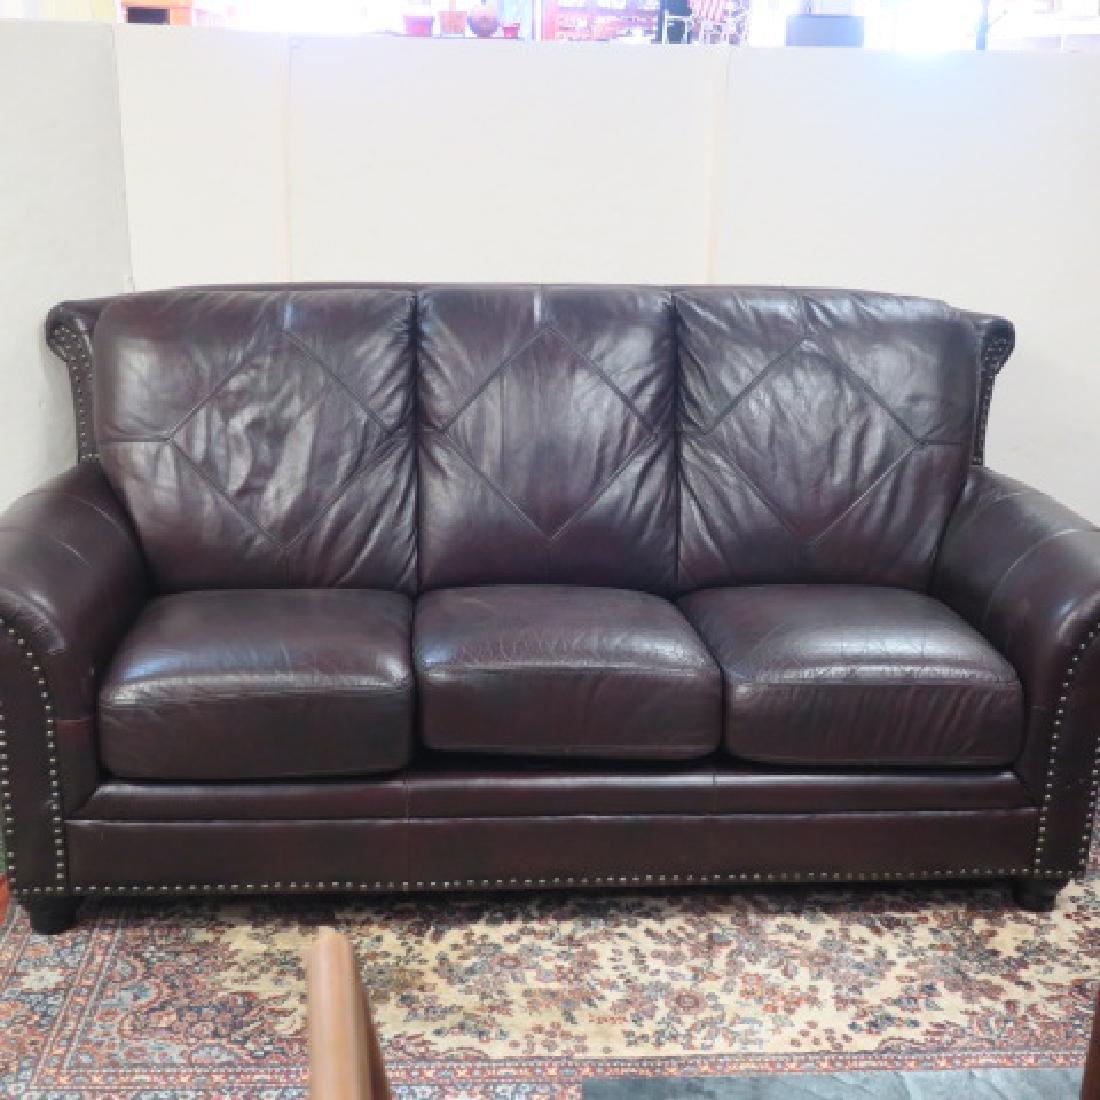 Three Cushion Leather Diamond Back Upholstered Sofa: